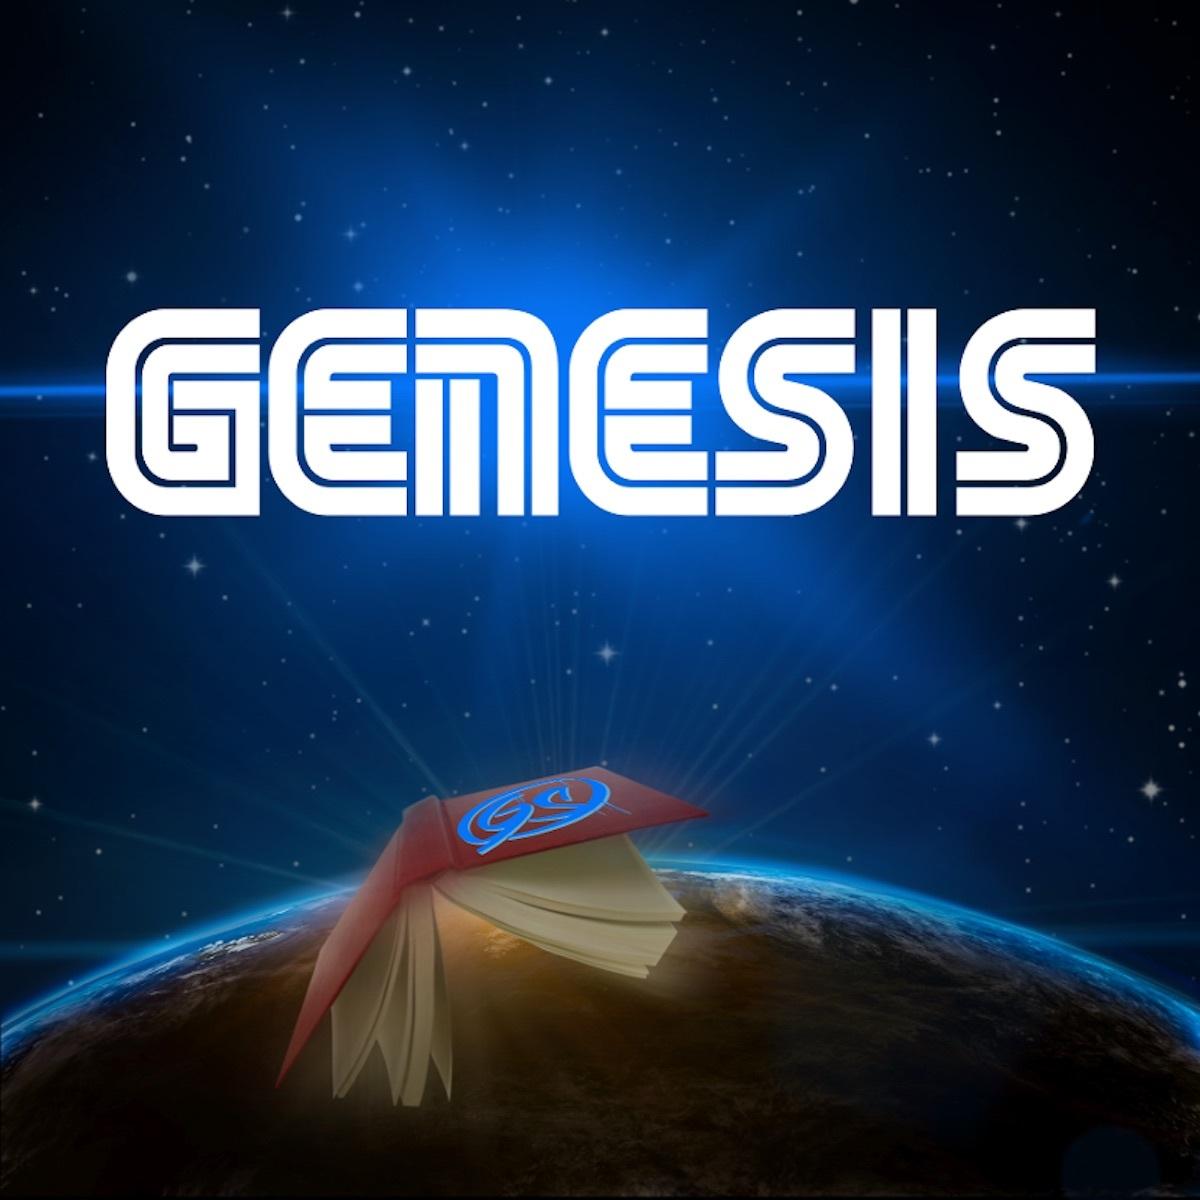 Derby's Gifted Specimenz Weave Together Grime, Rap, Bassline And More On 'Genesis' EP